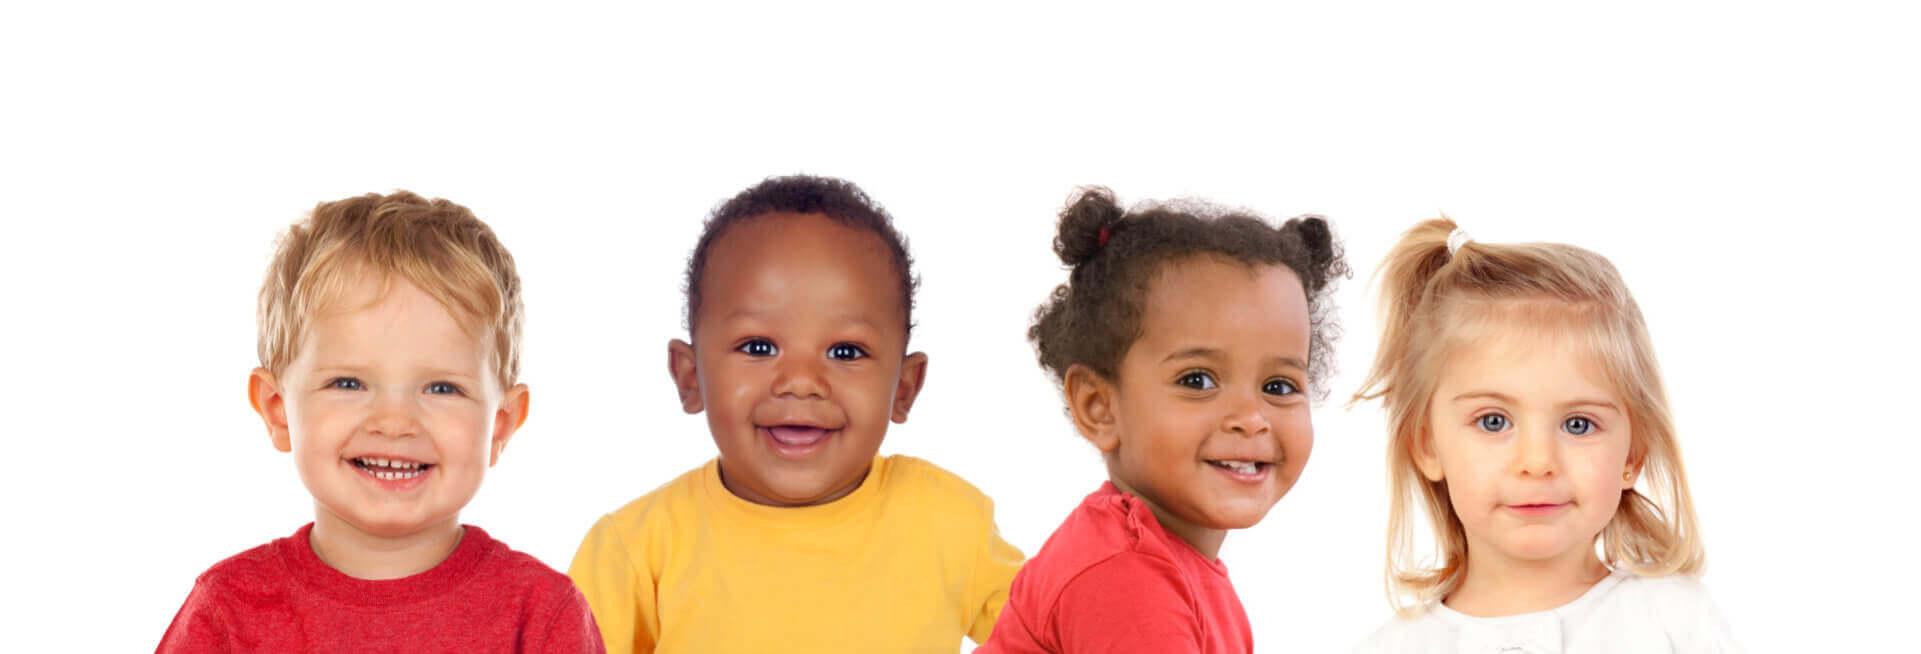 four babies smiling